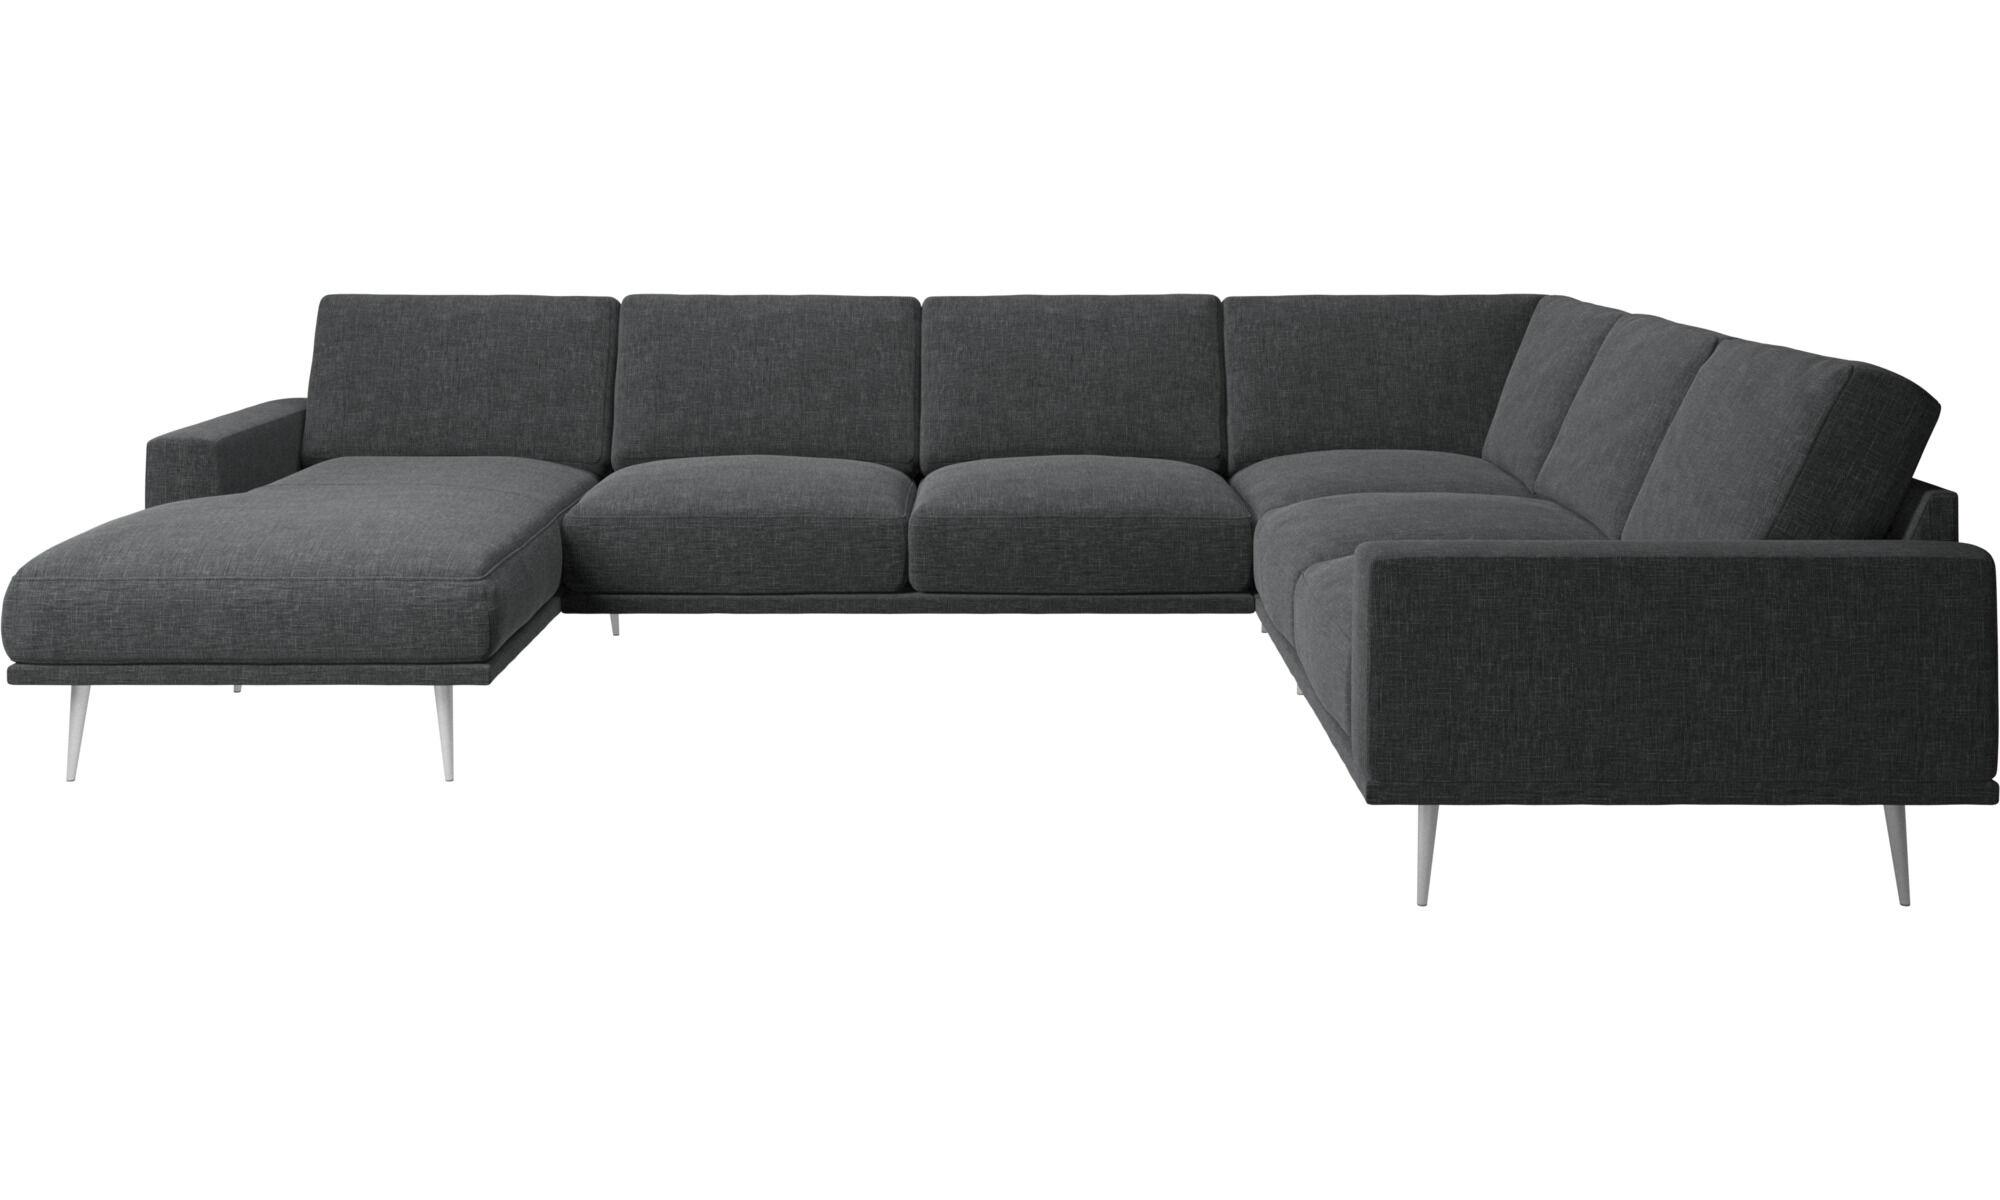 Carlton Corner Sofa With Resting Unit